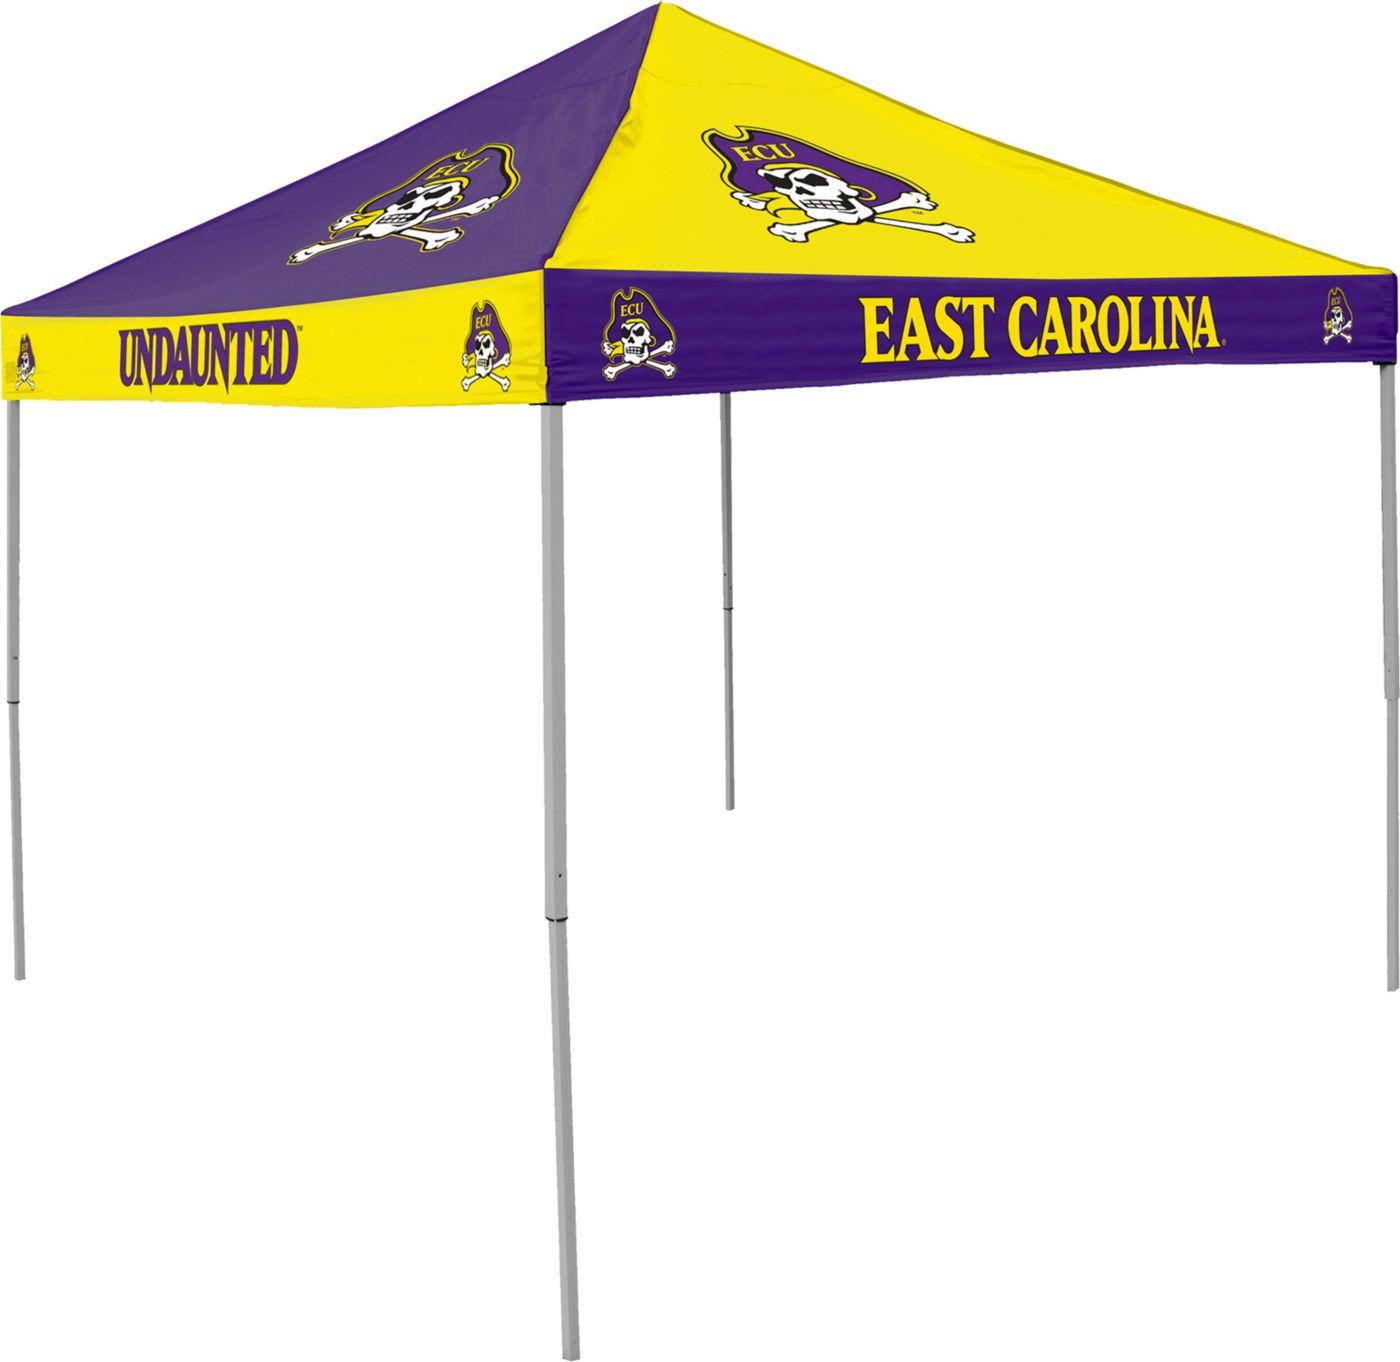 East Carolina Pirates Checkerboard Tent